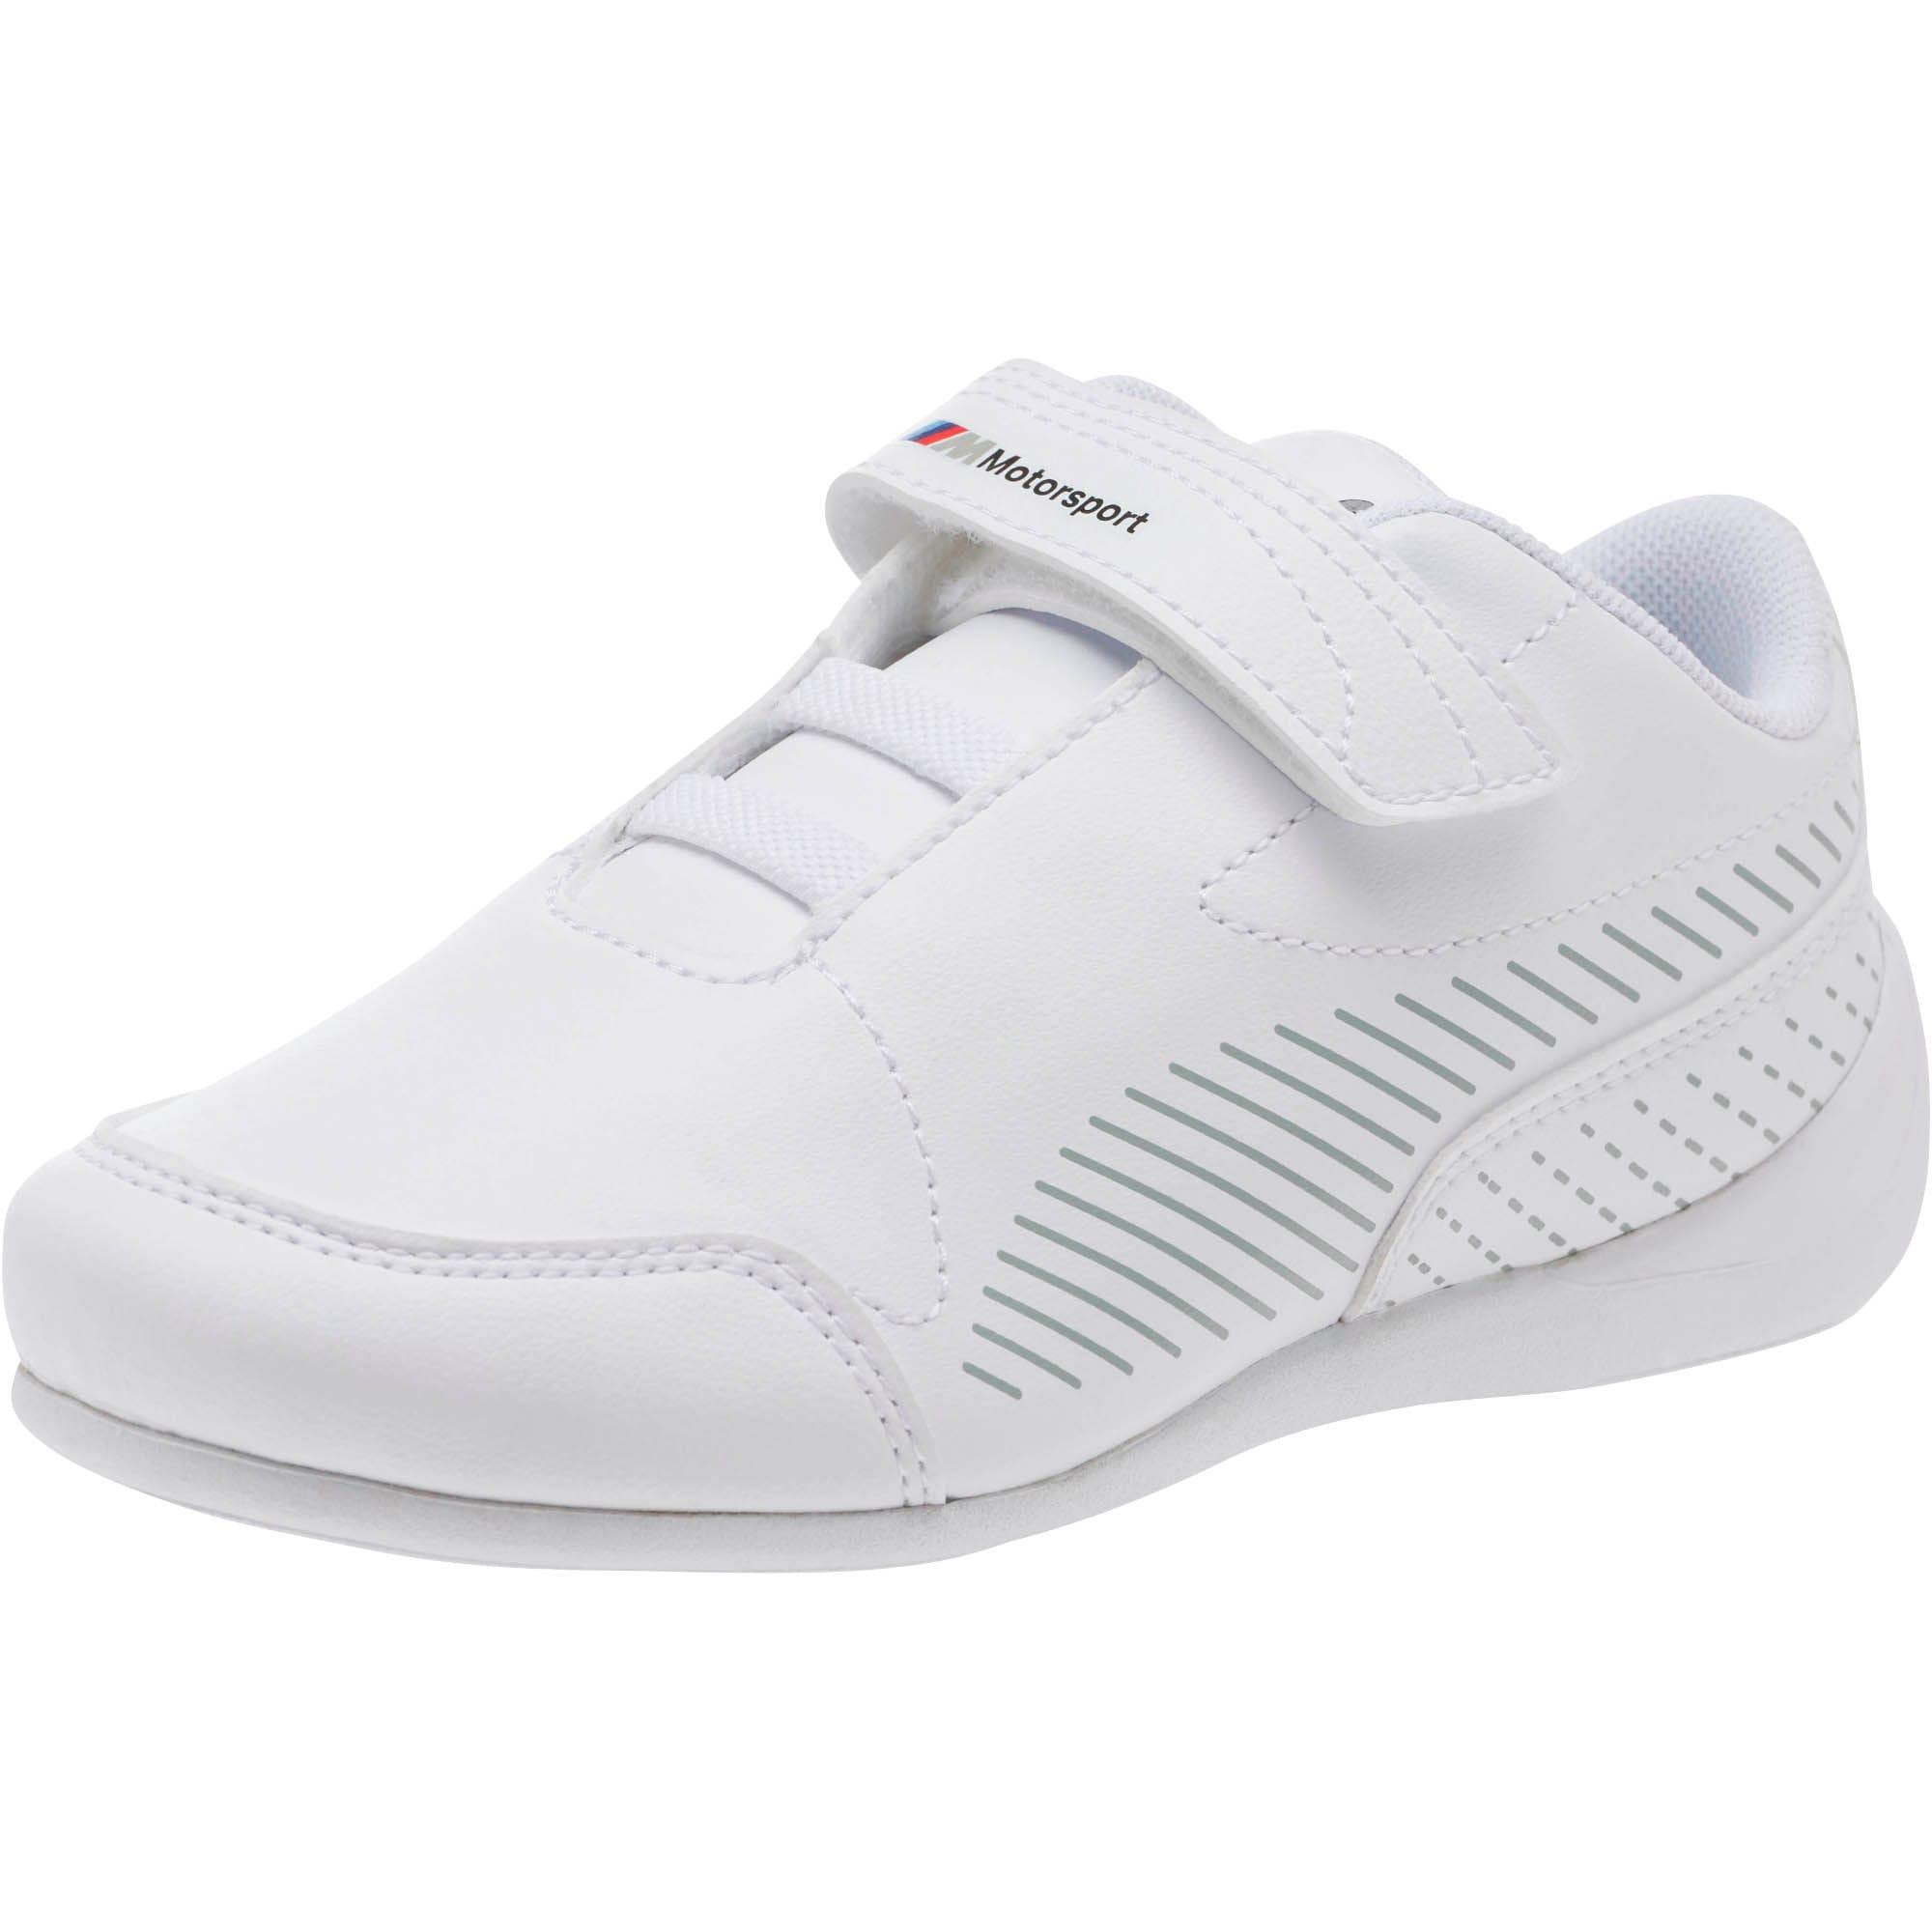 Thumbnail 1 of BMW MMS Drift Cat 7S Ultra Little Kids' Shoes, Puma White-Puma White, medium